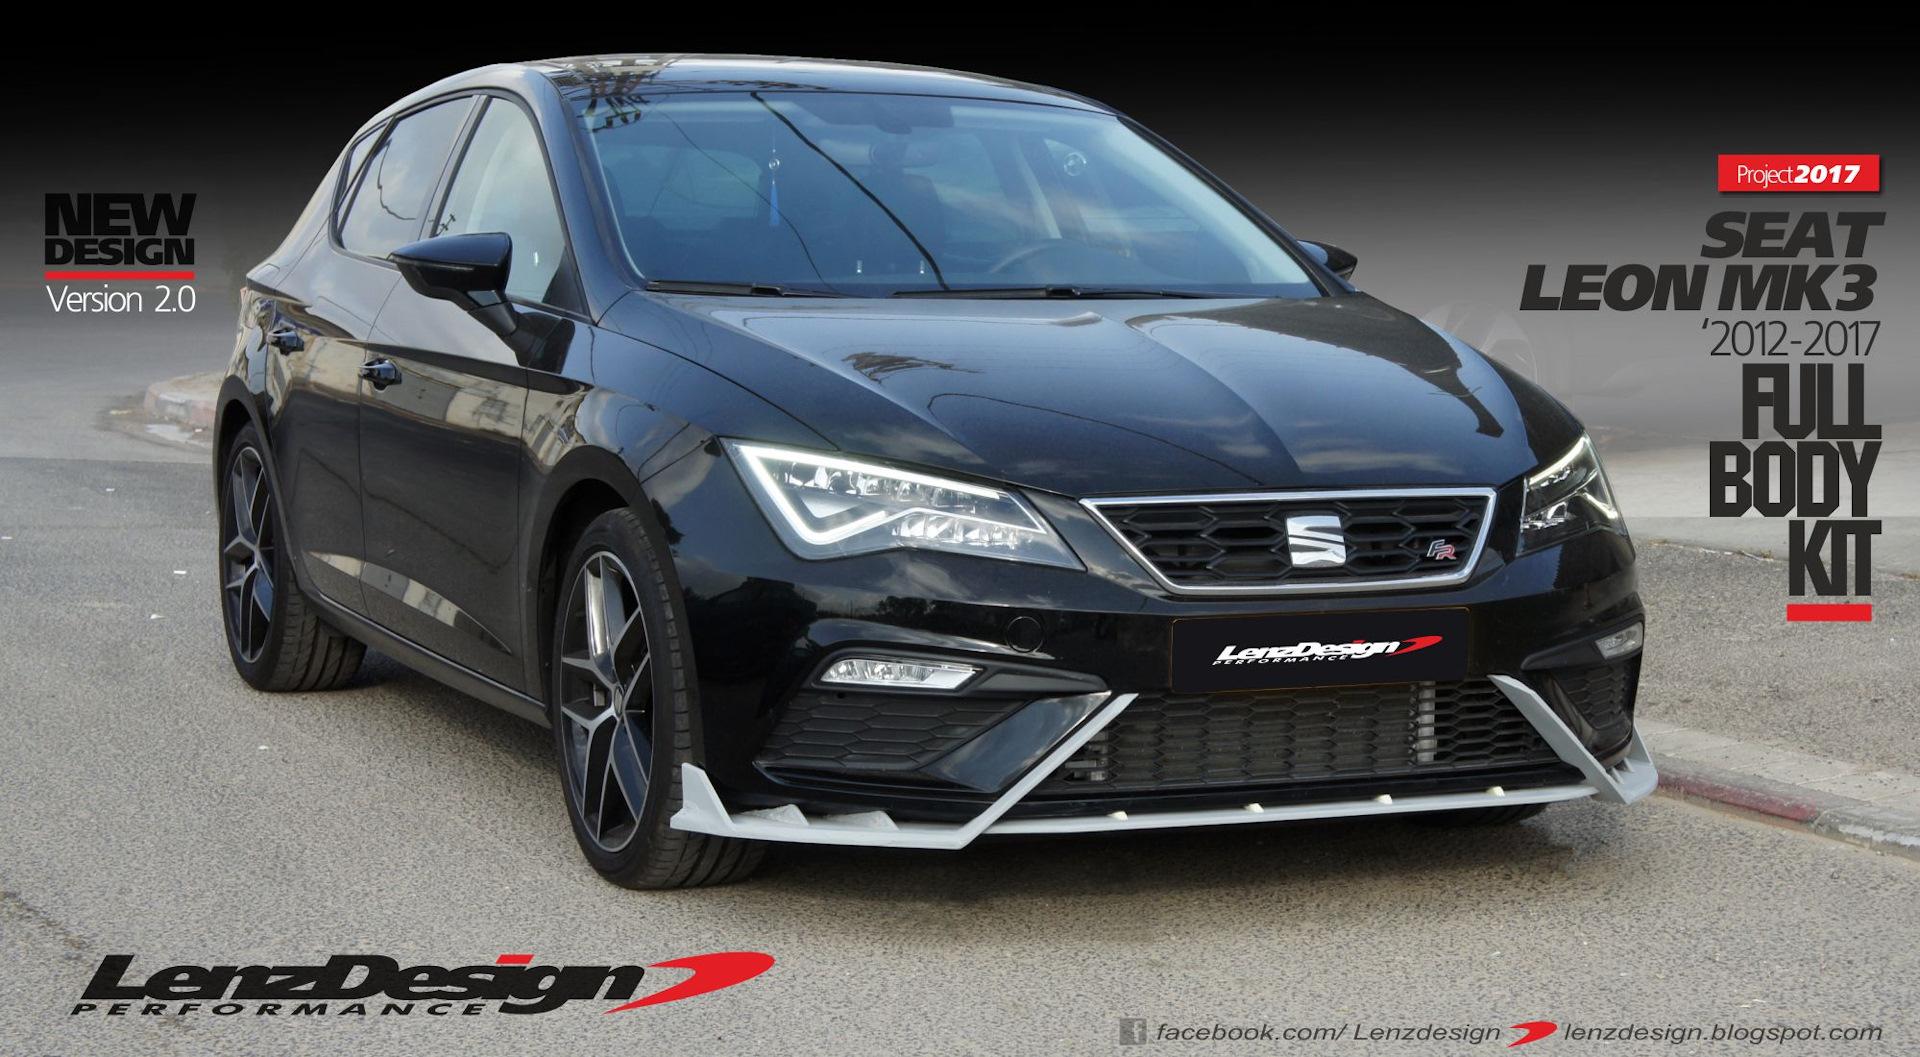 Seat Leon Mk3 5F Tuning & Body Kit Lenzdesign Performance ...